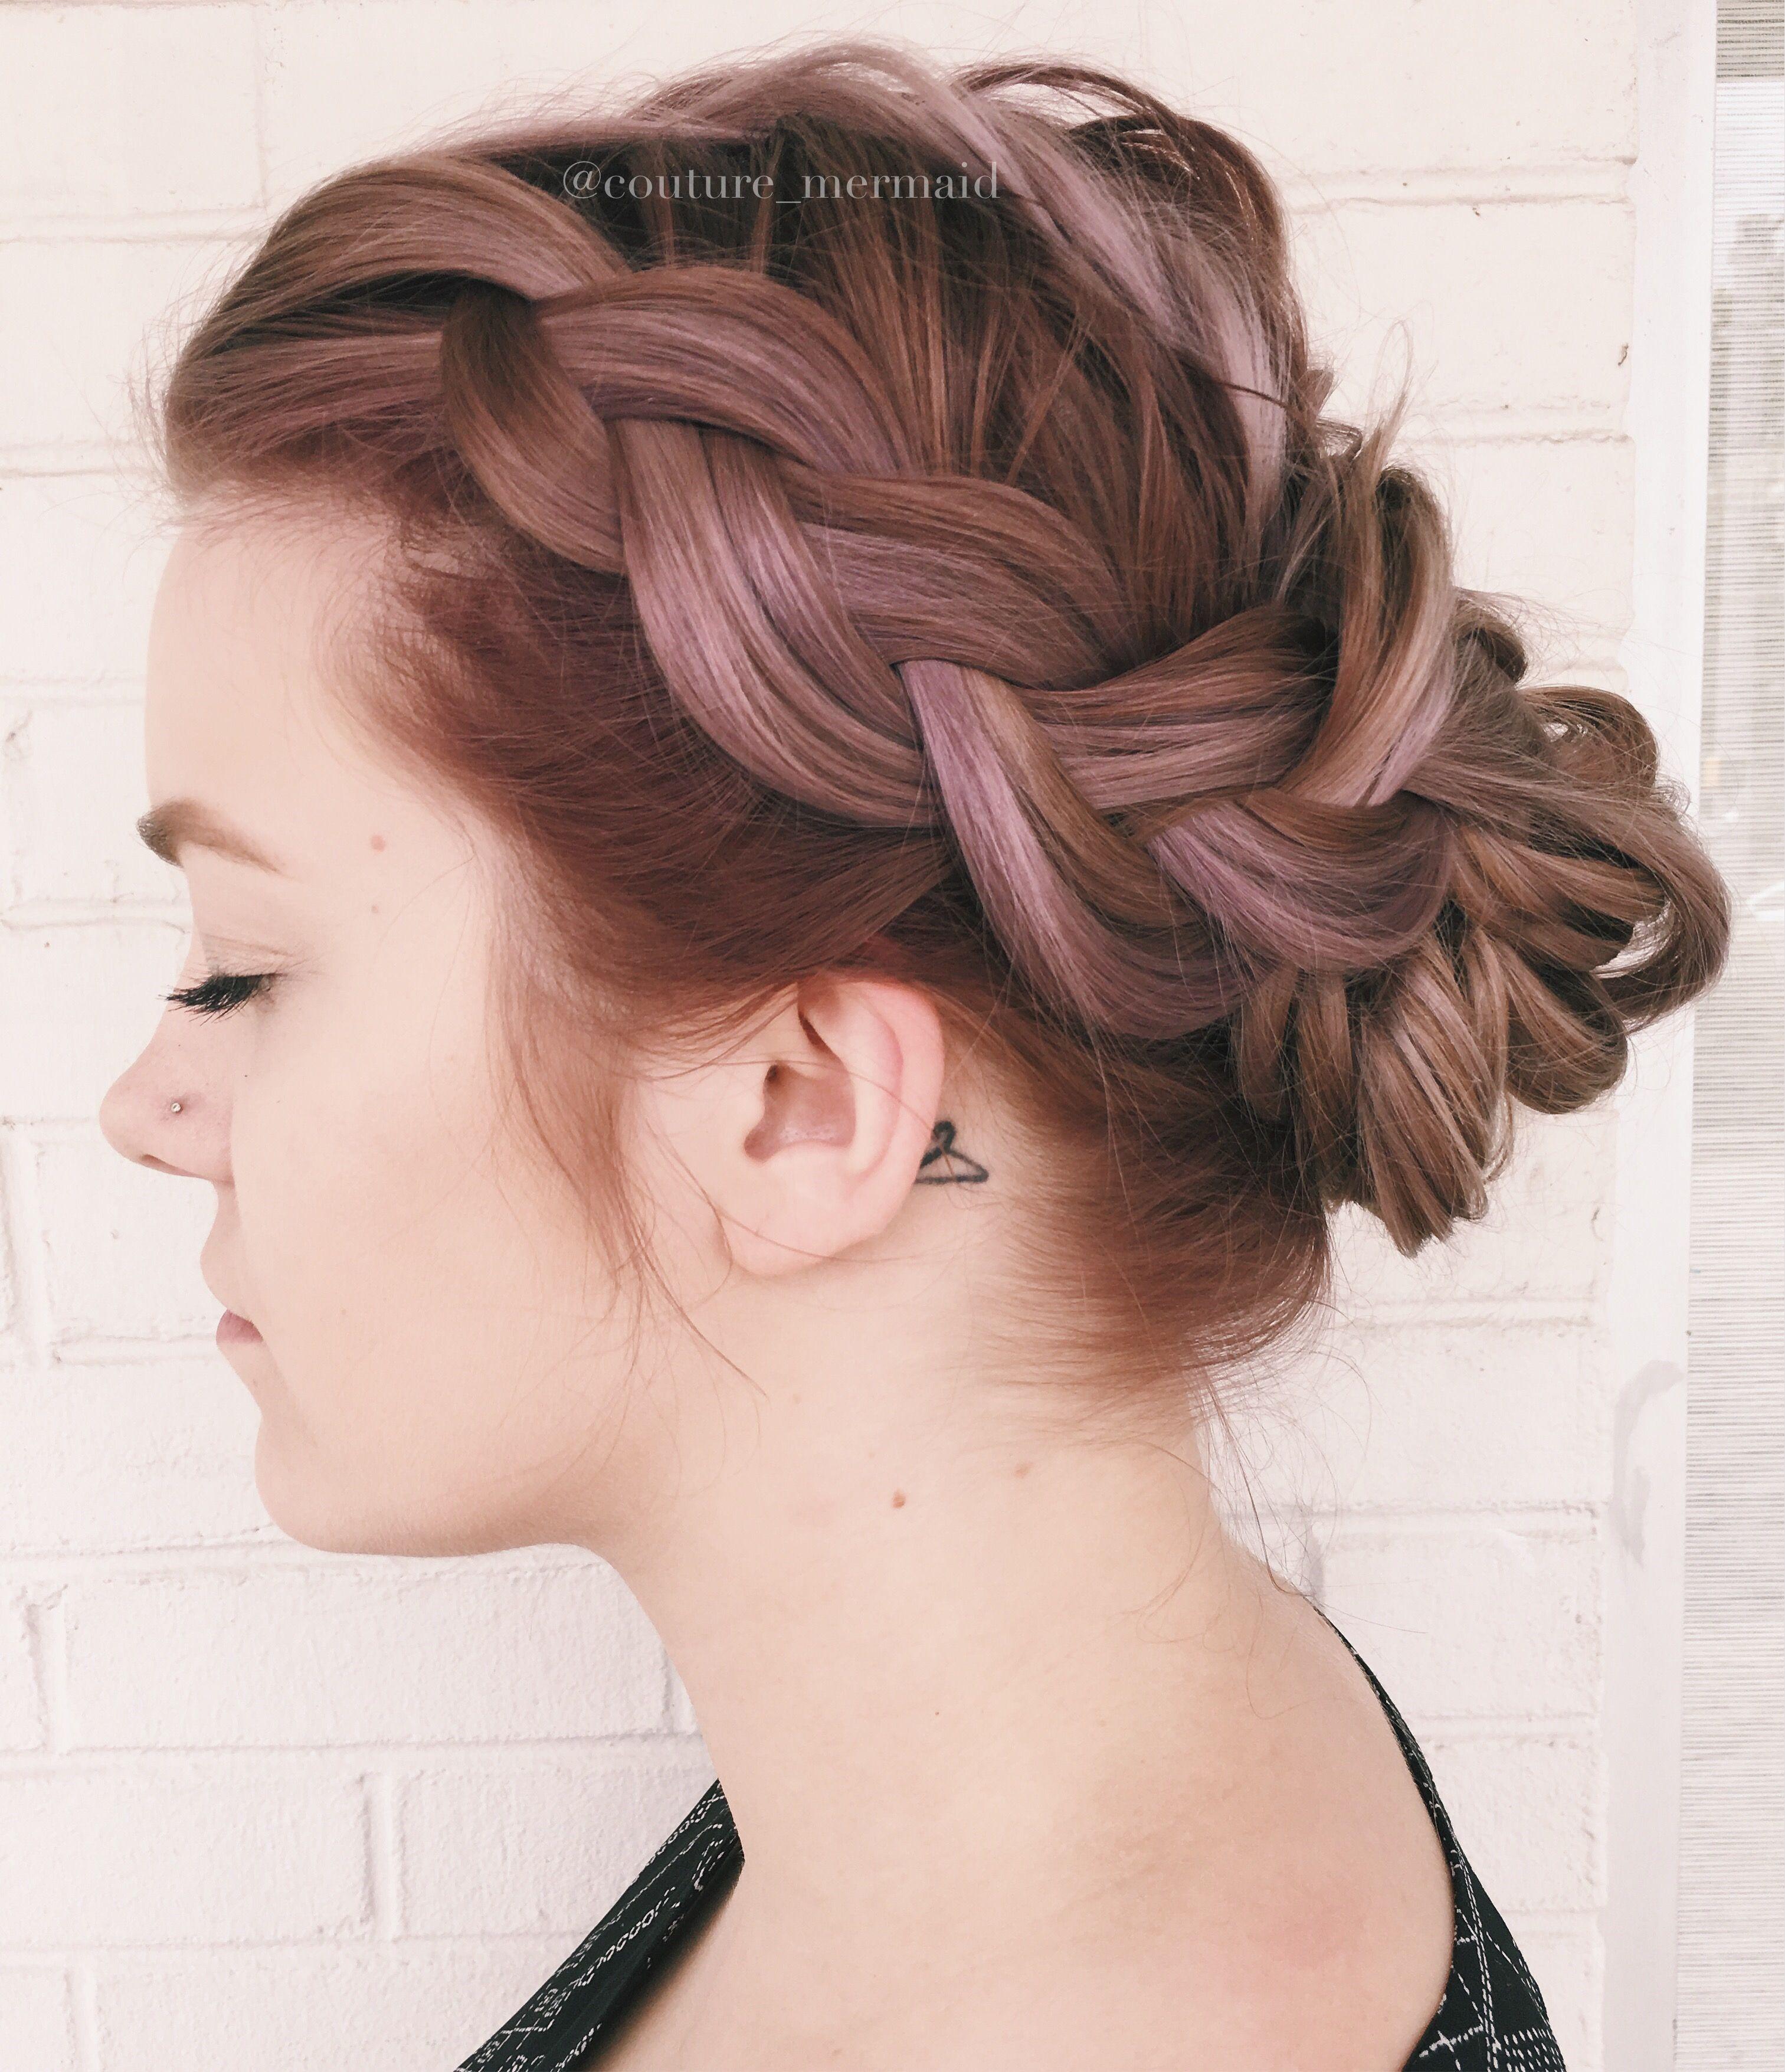 15+ unutterable hairstyles trenzas ideas | updos everyday